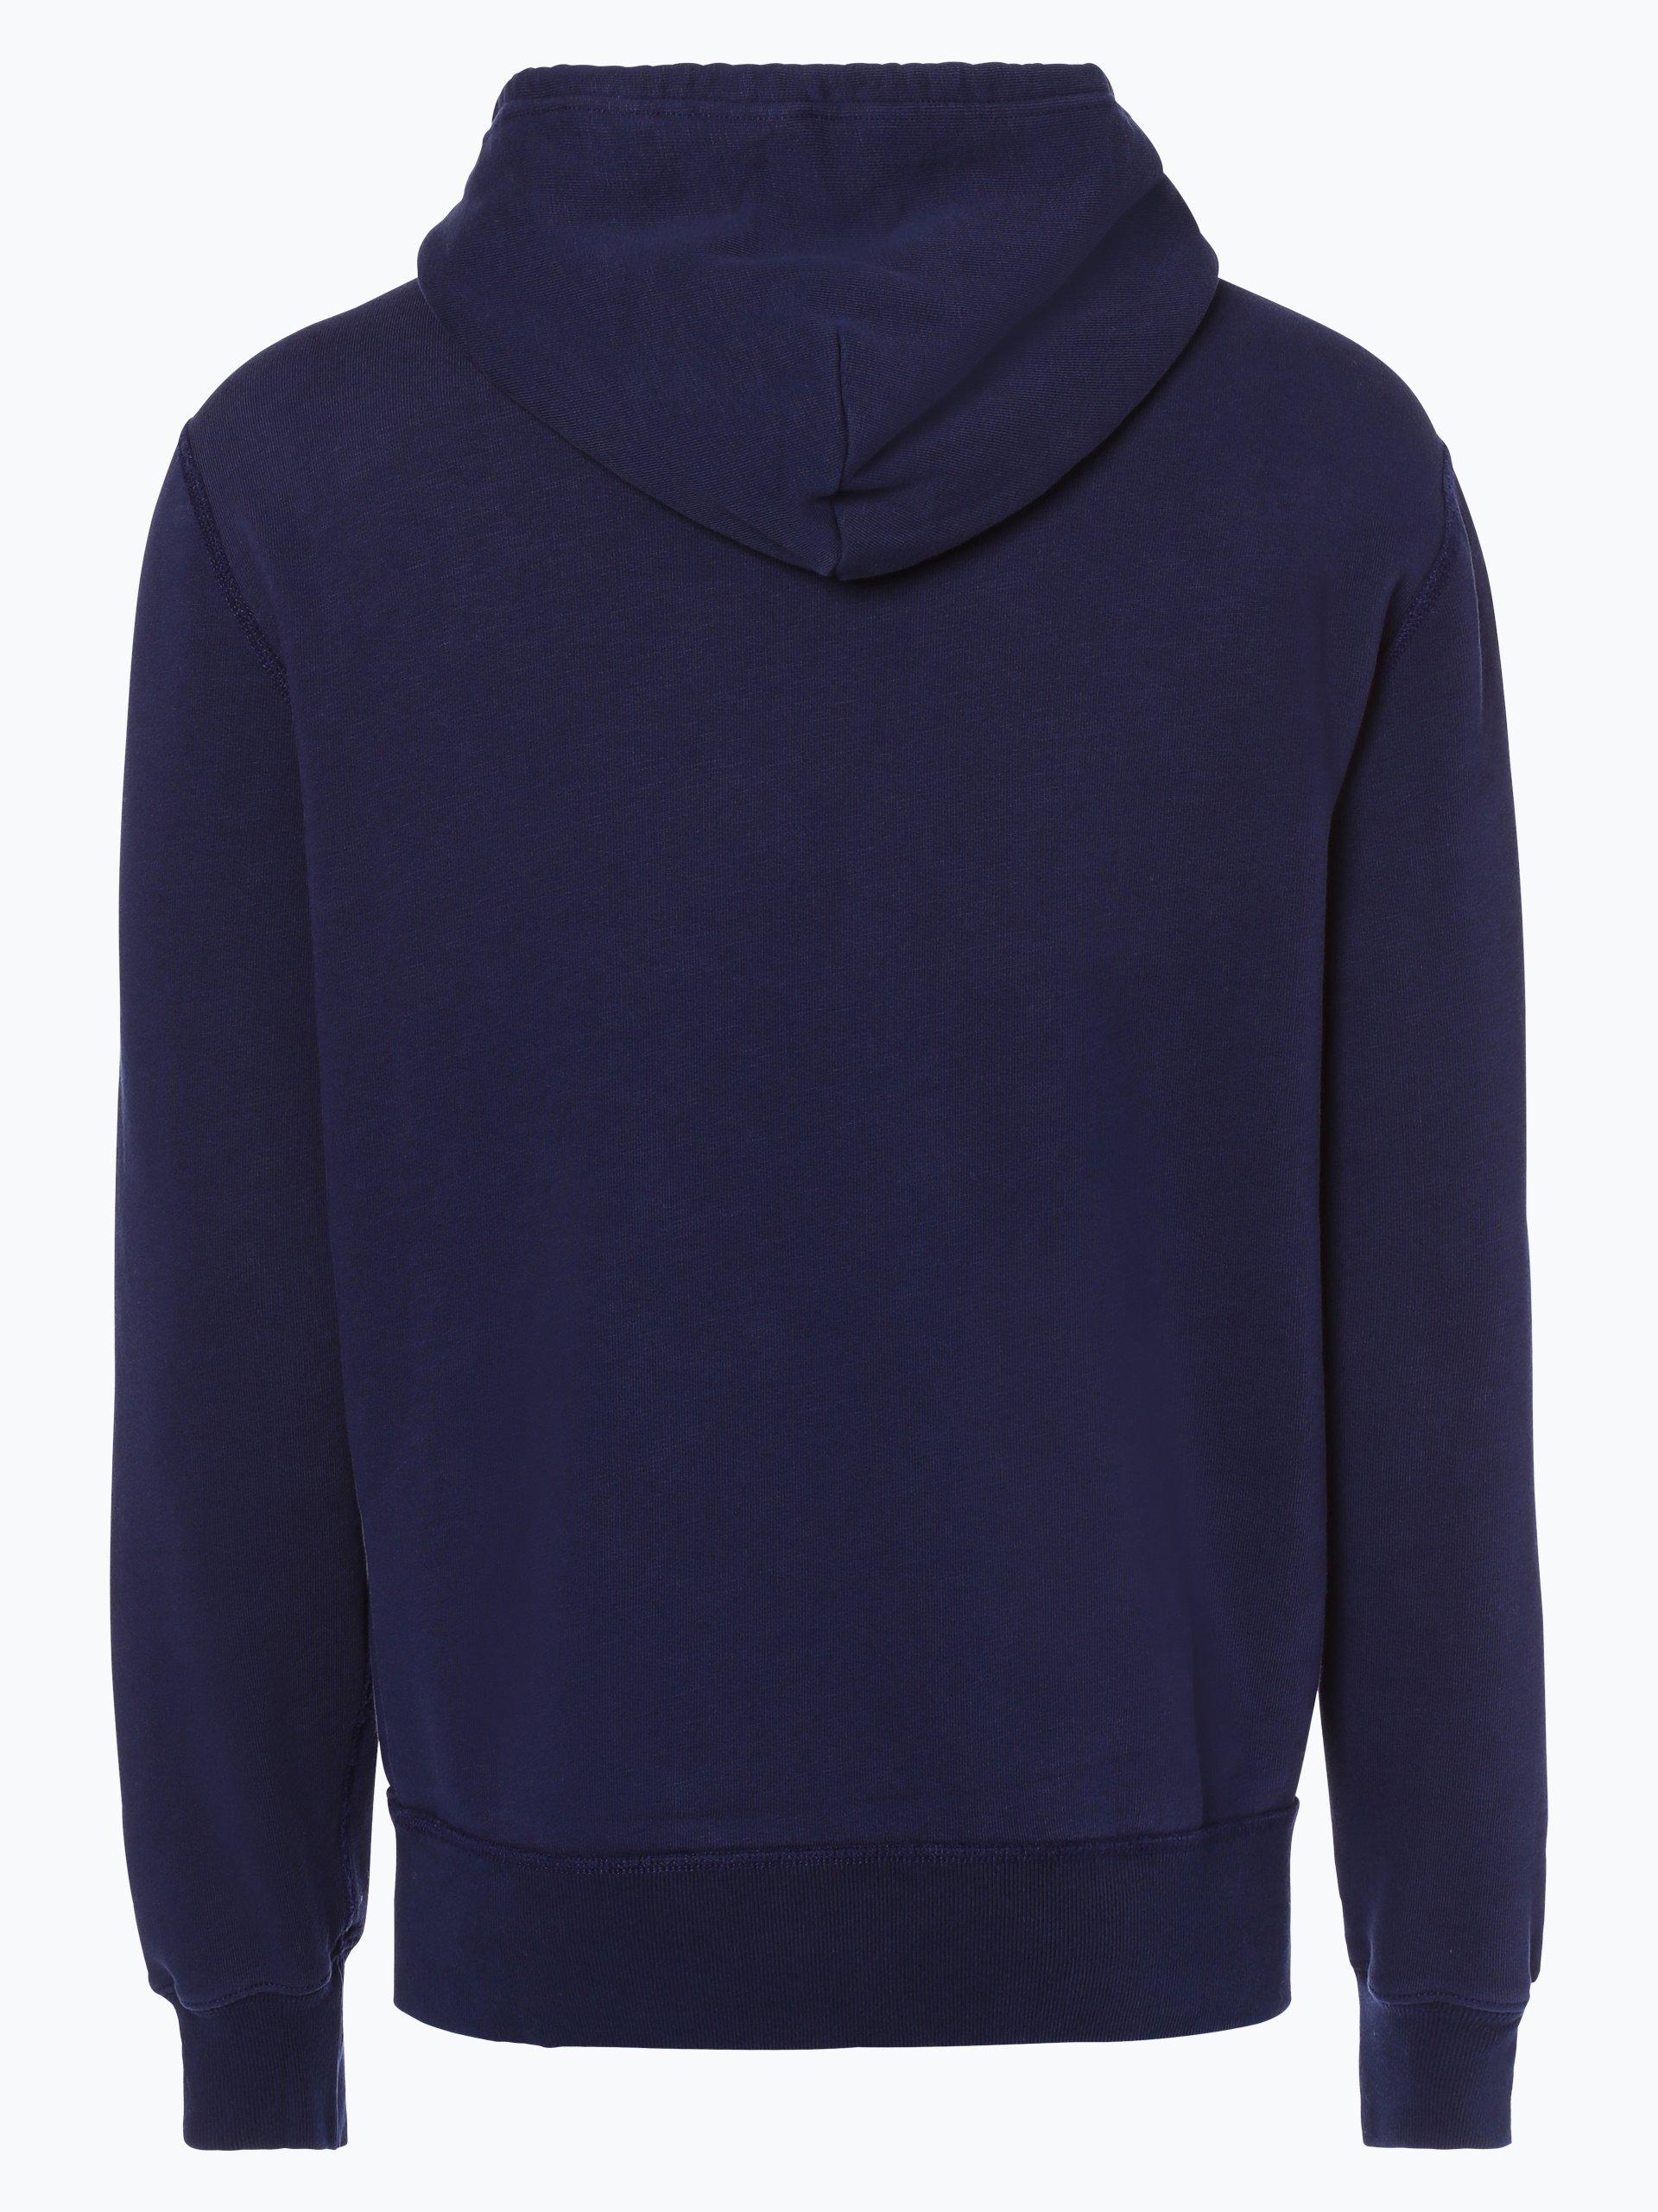 polo ralph lauren herren sweatshirt 2 online kaufen peek und cloppenburg de. Black Bedroom Furniture Sets. Home Design Ideas